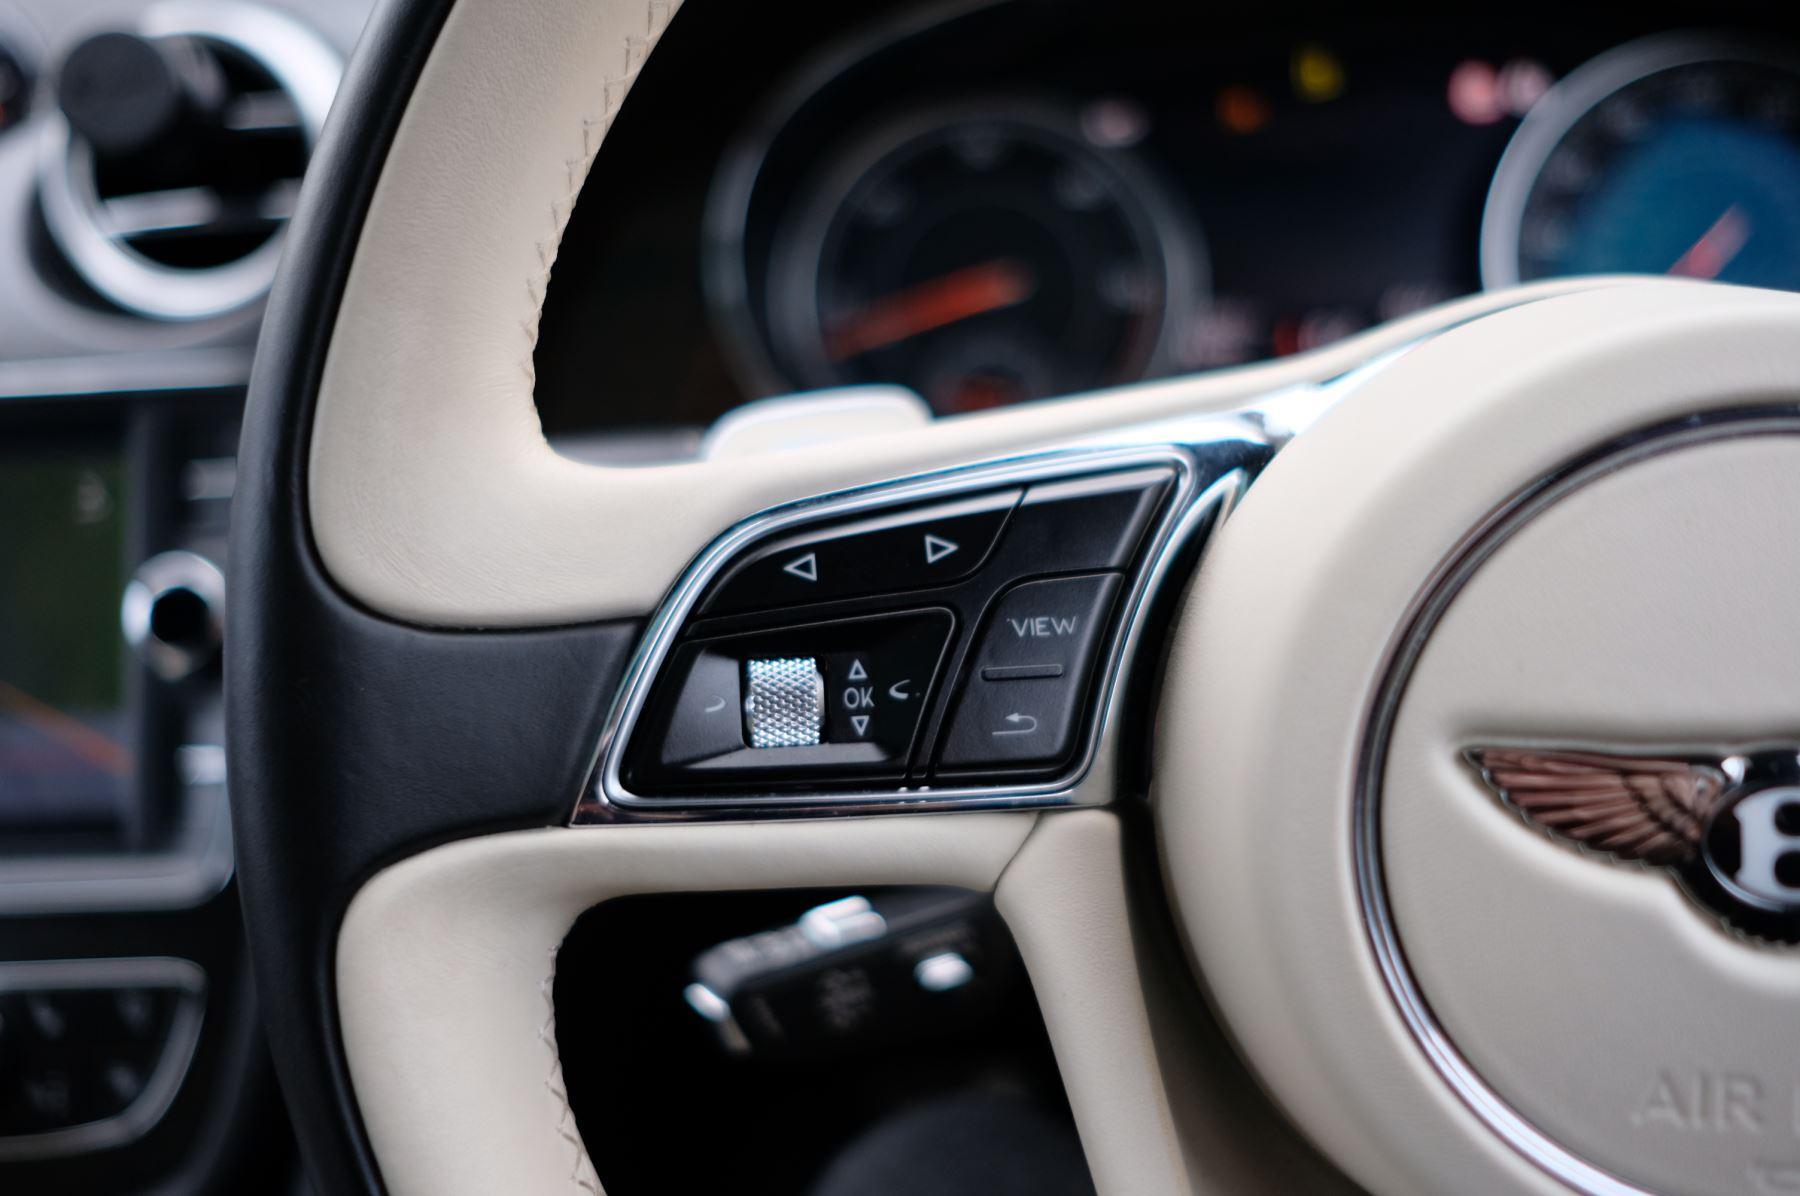 Bentley Bentayga Diesel 4.0 V8 Mulliner Driving Spec 5dr Auto - 7 Seat Specification image 26